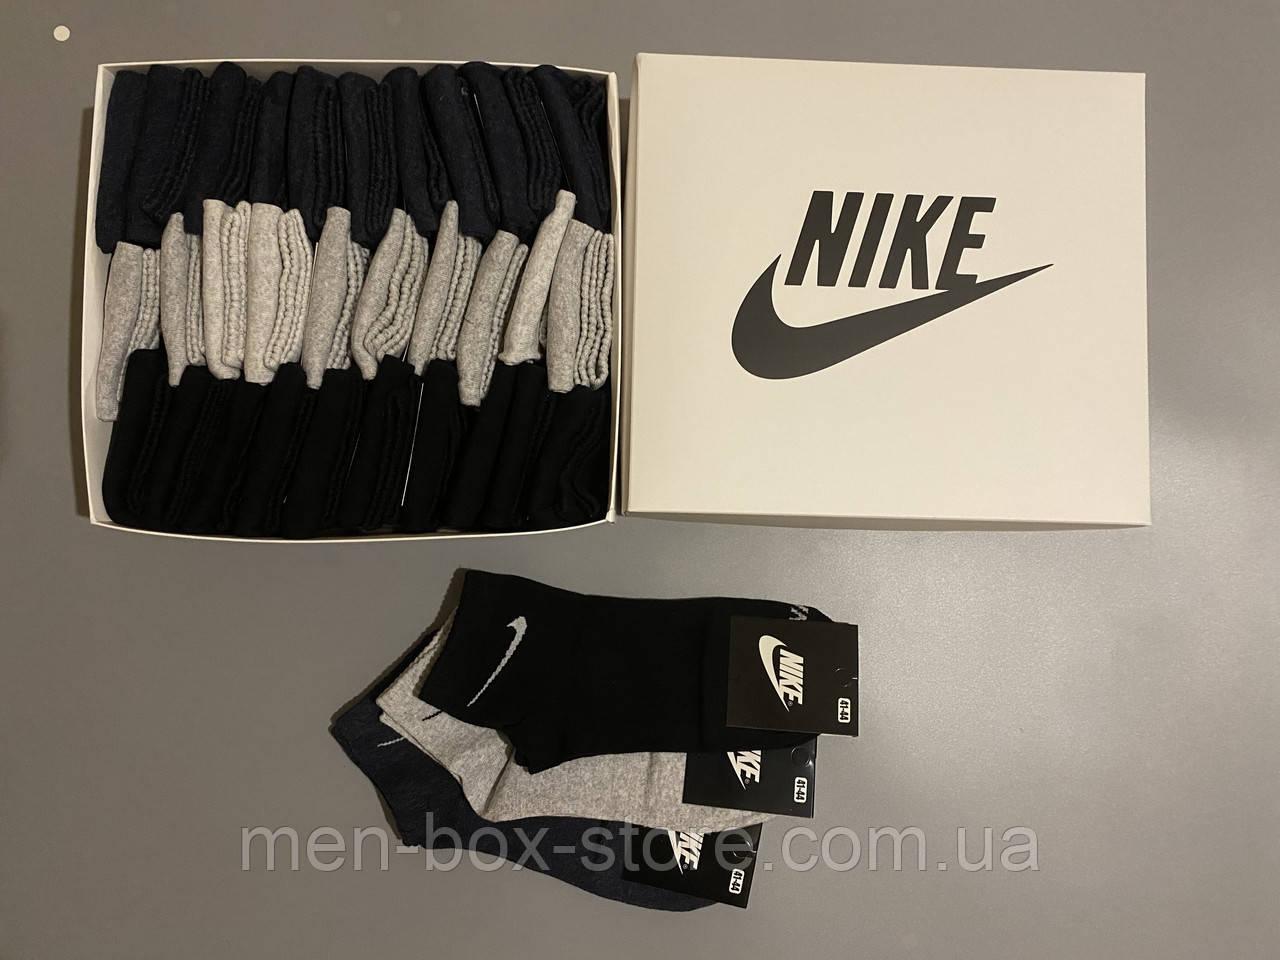 Мужские носки NIKE в подарочной упаковке/30 пар.НАЙК носки мужские носки средние носки турция носки